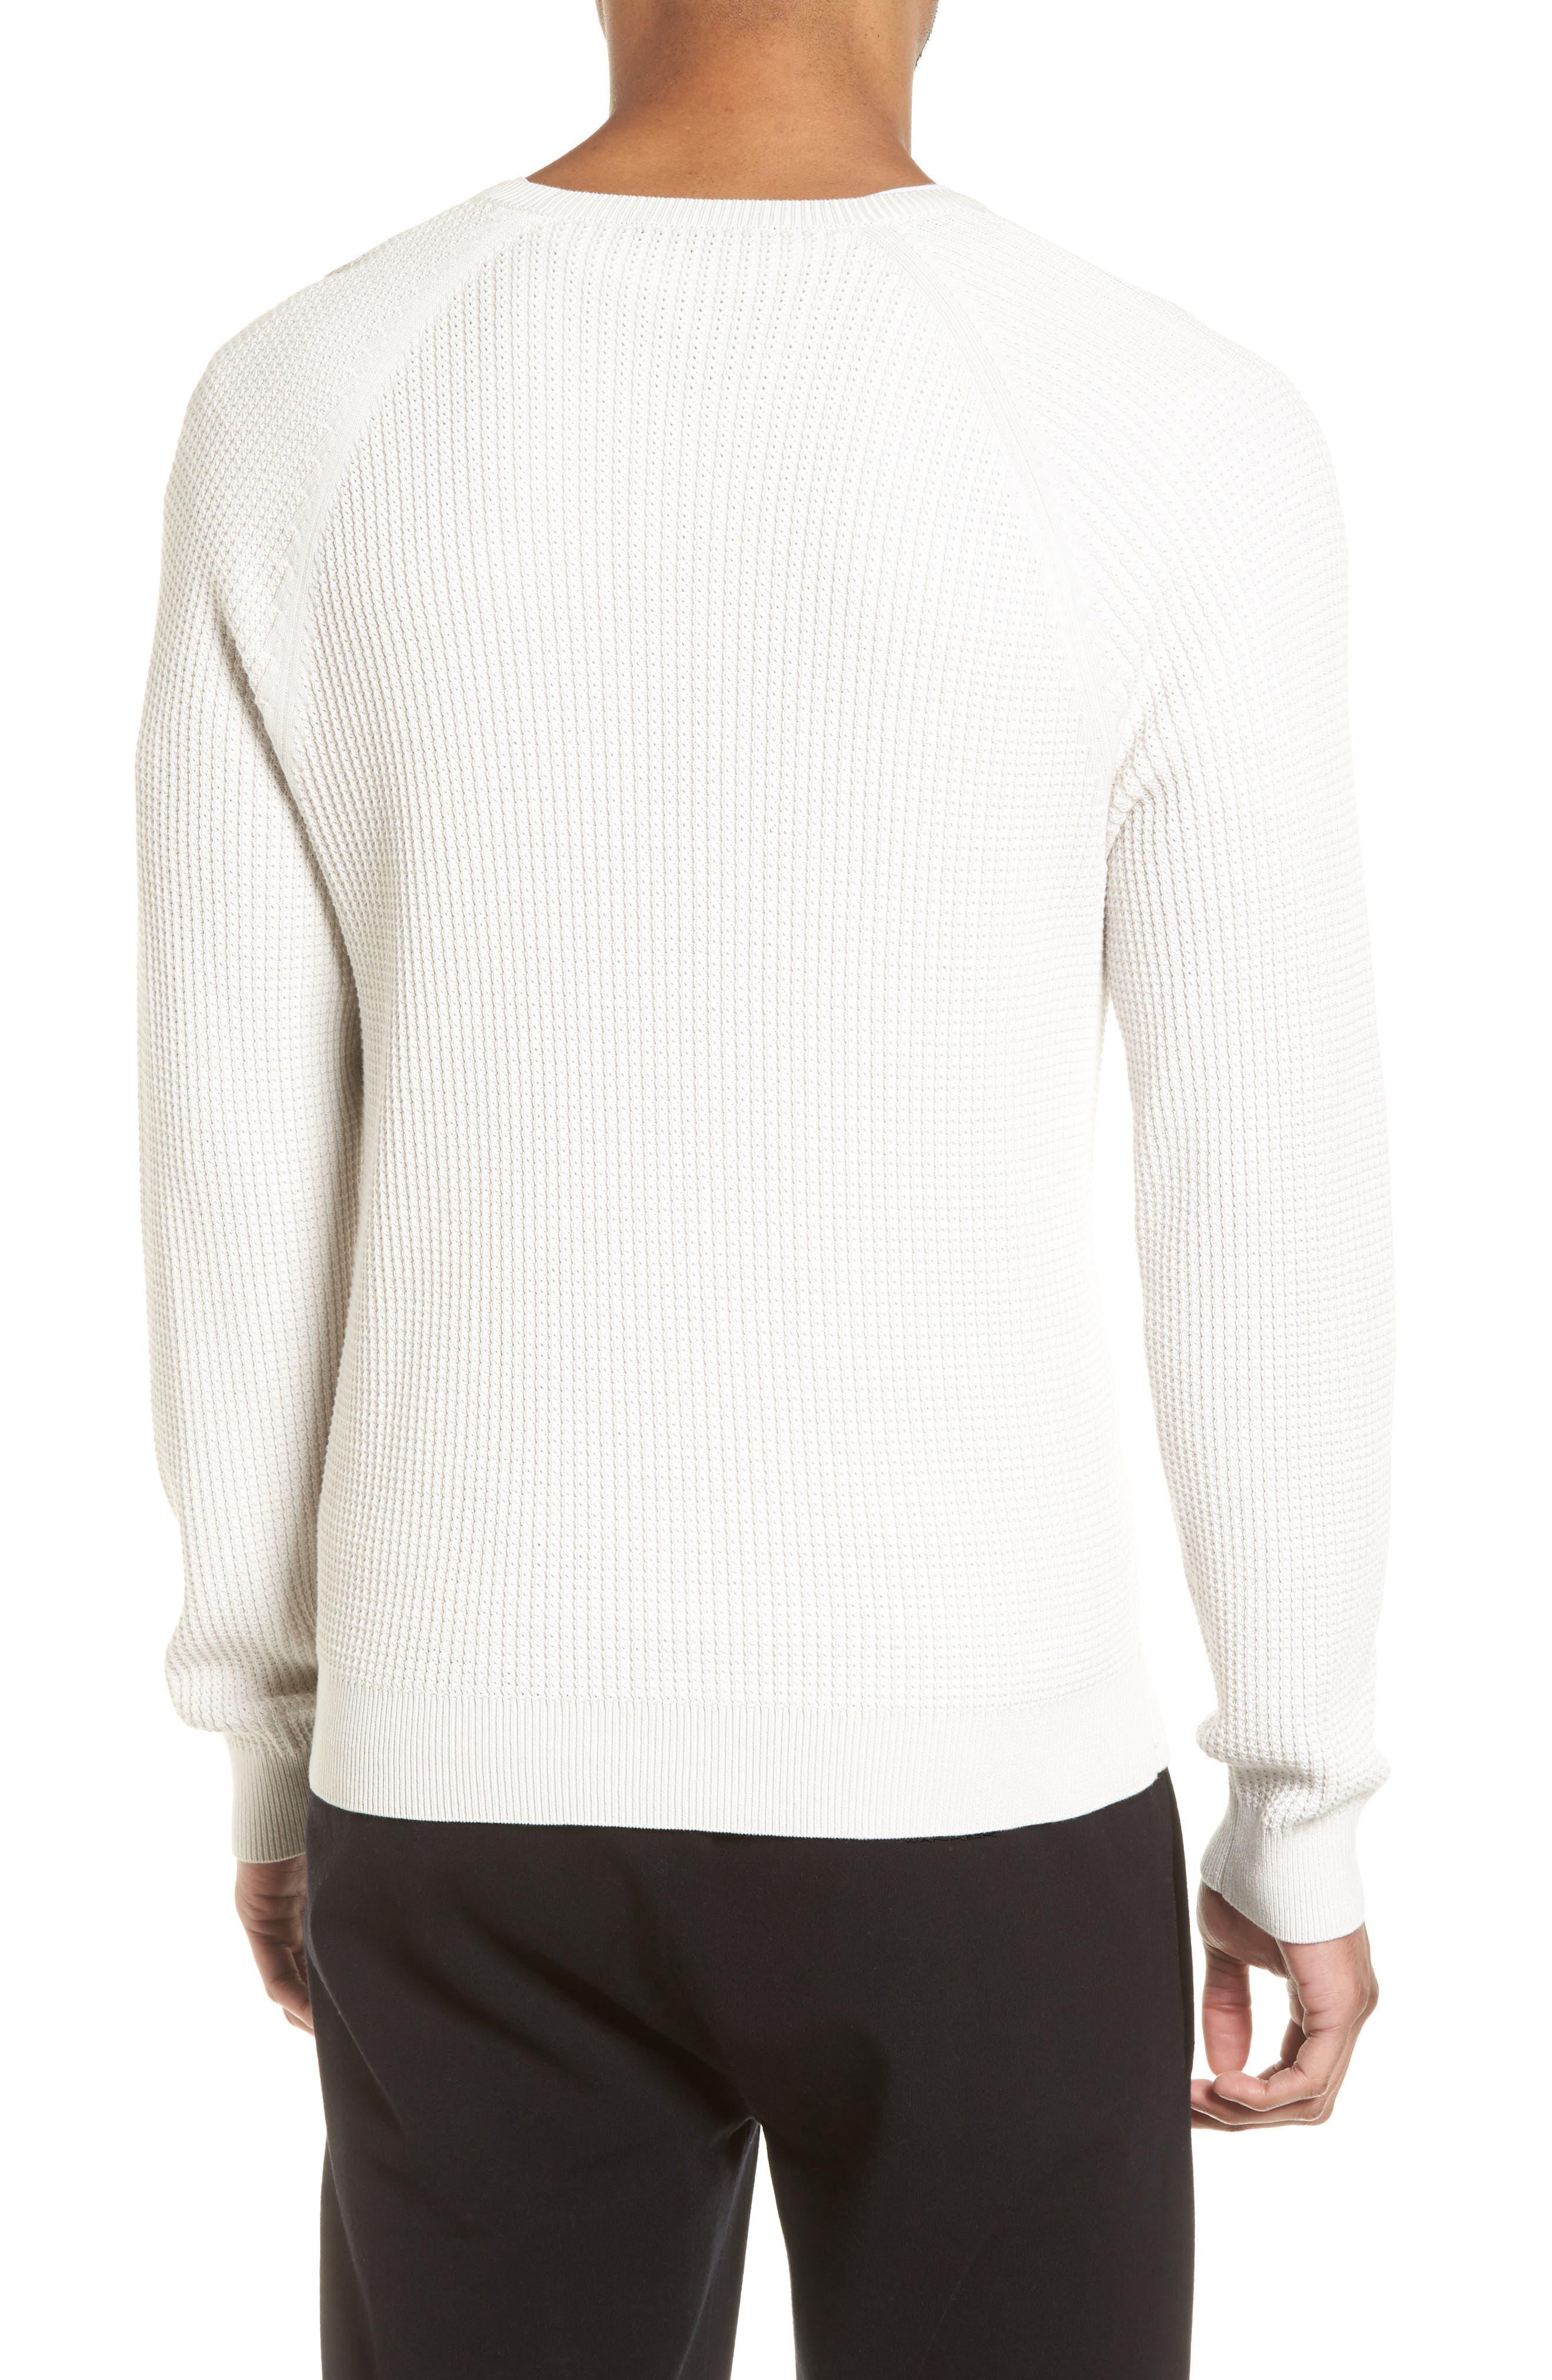 Slim Fit Thermal Knit Raglan Sweater,                             Alternate thumbnail 2, color,                             100